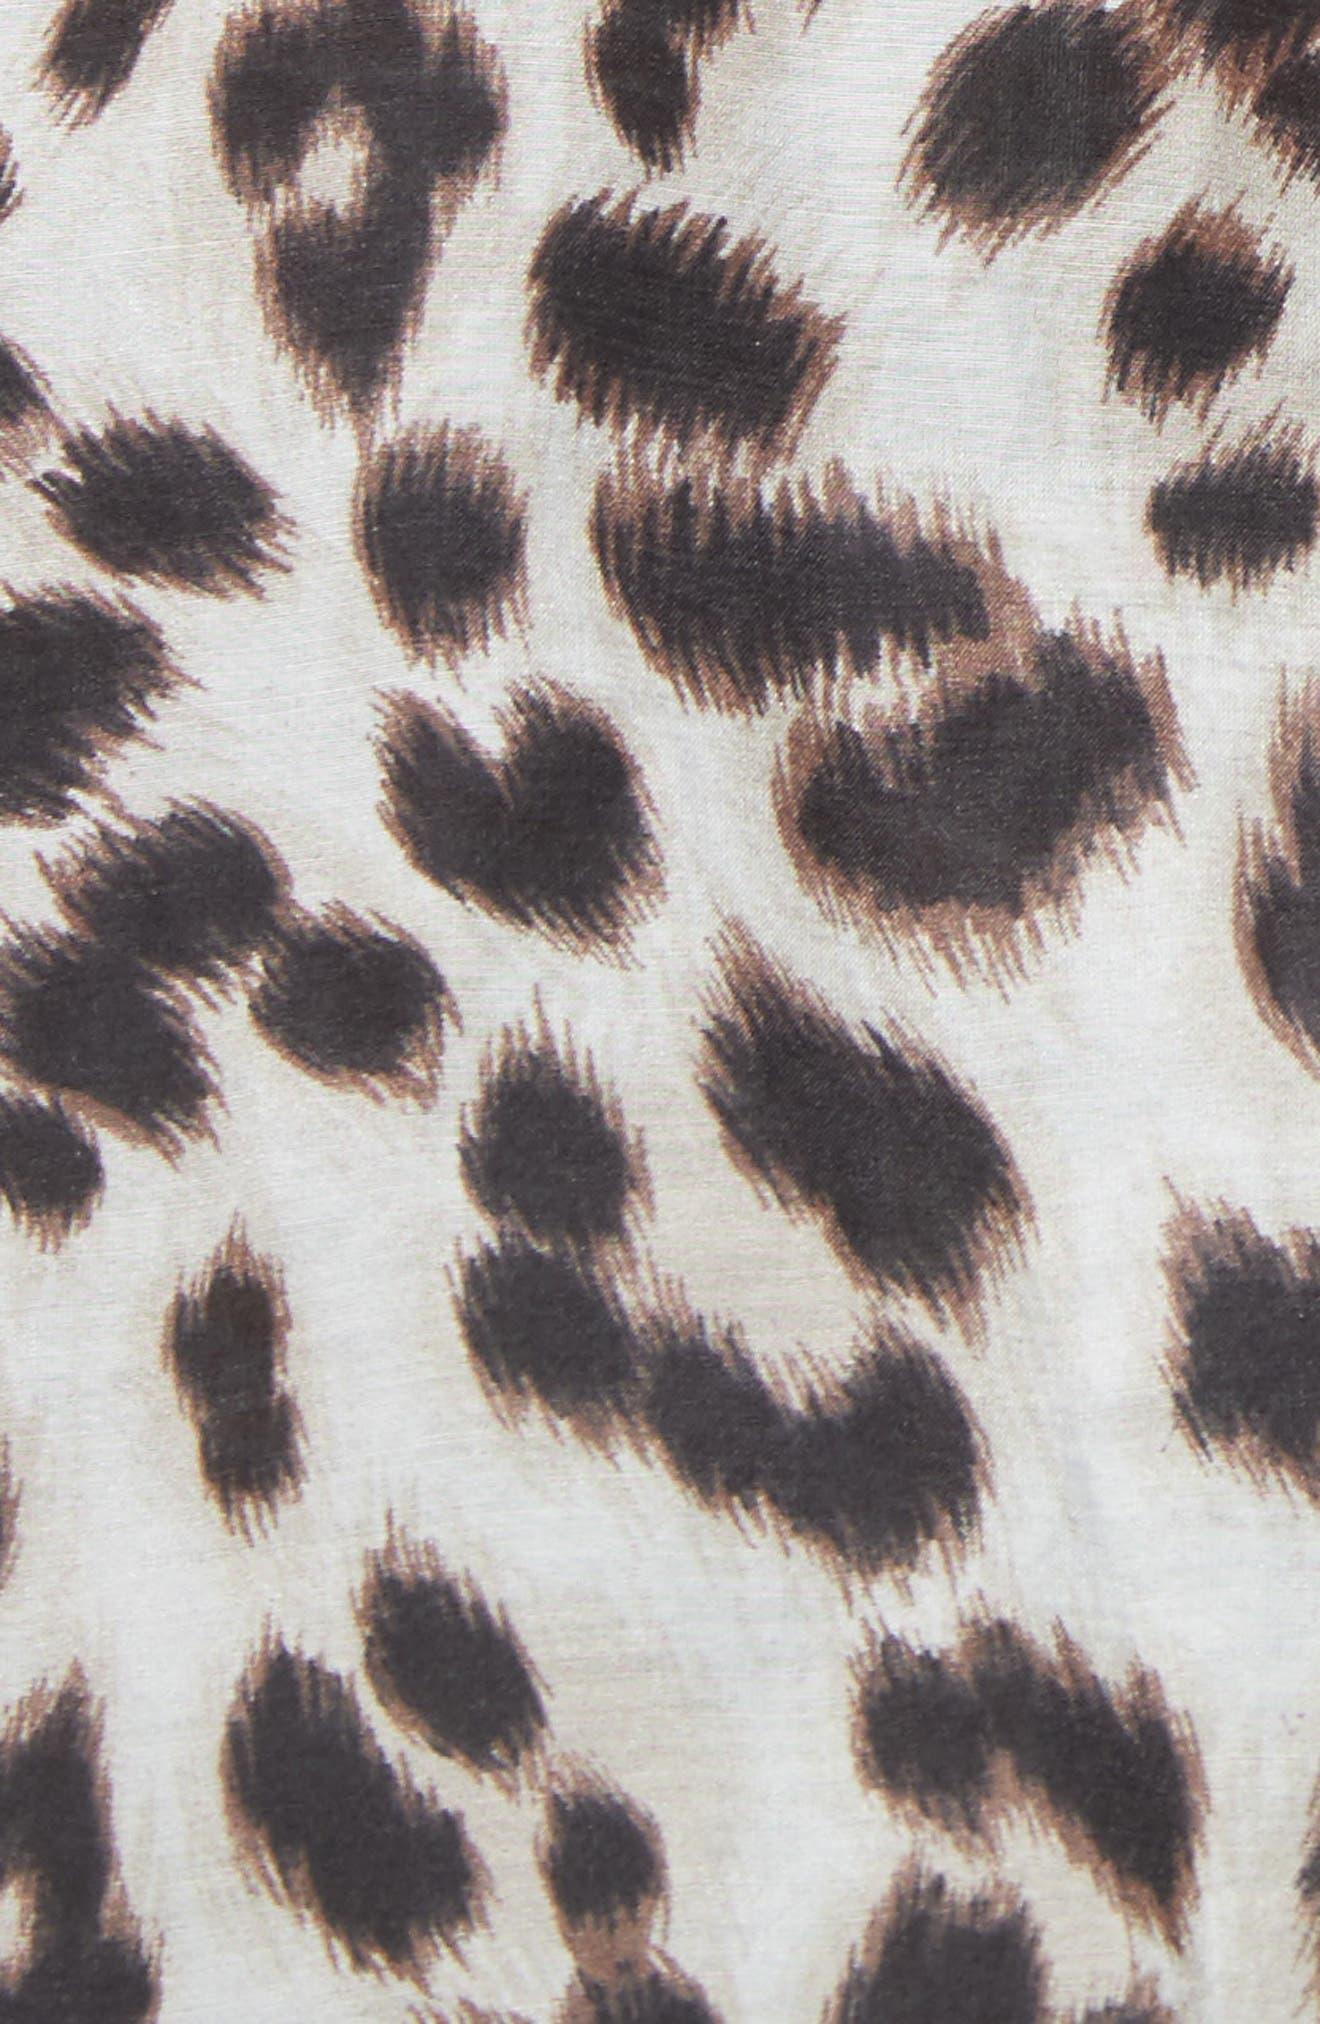 Daddy Leopard Print Blouse,                             Alternate thumbnail 5, color,                             118